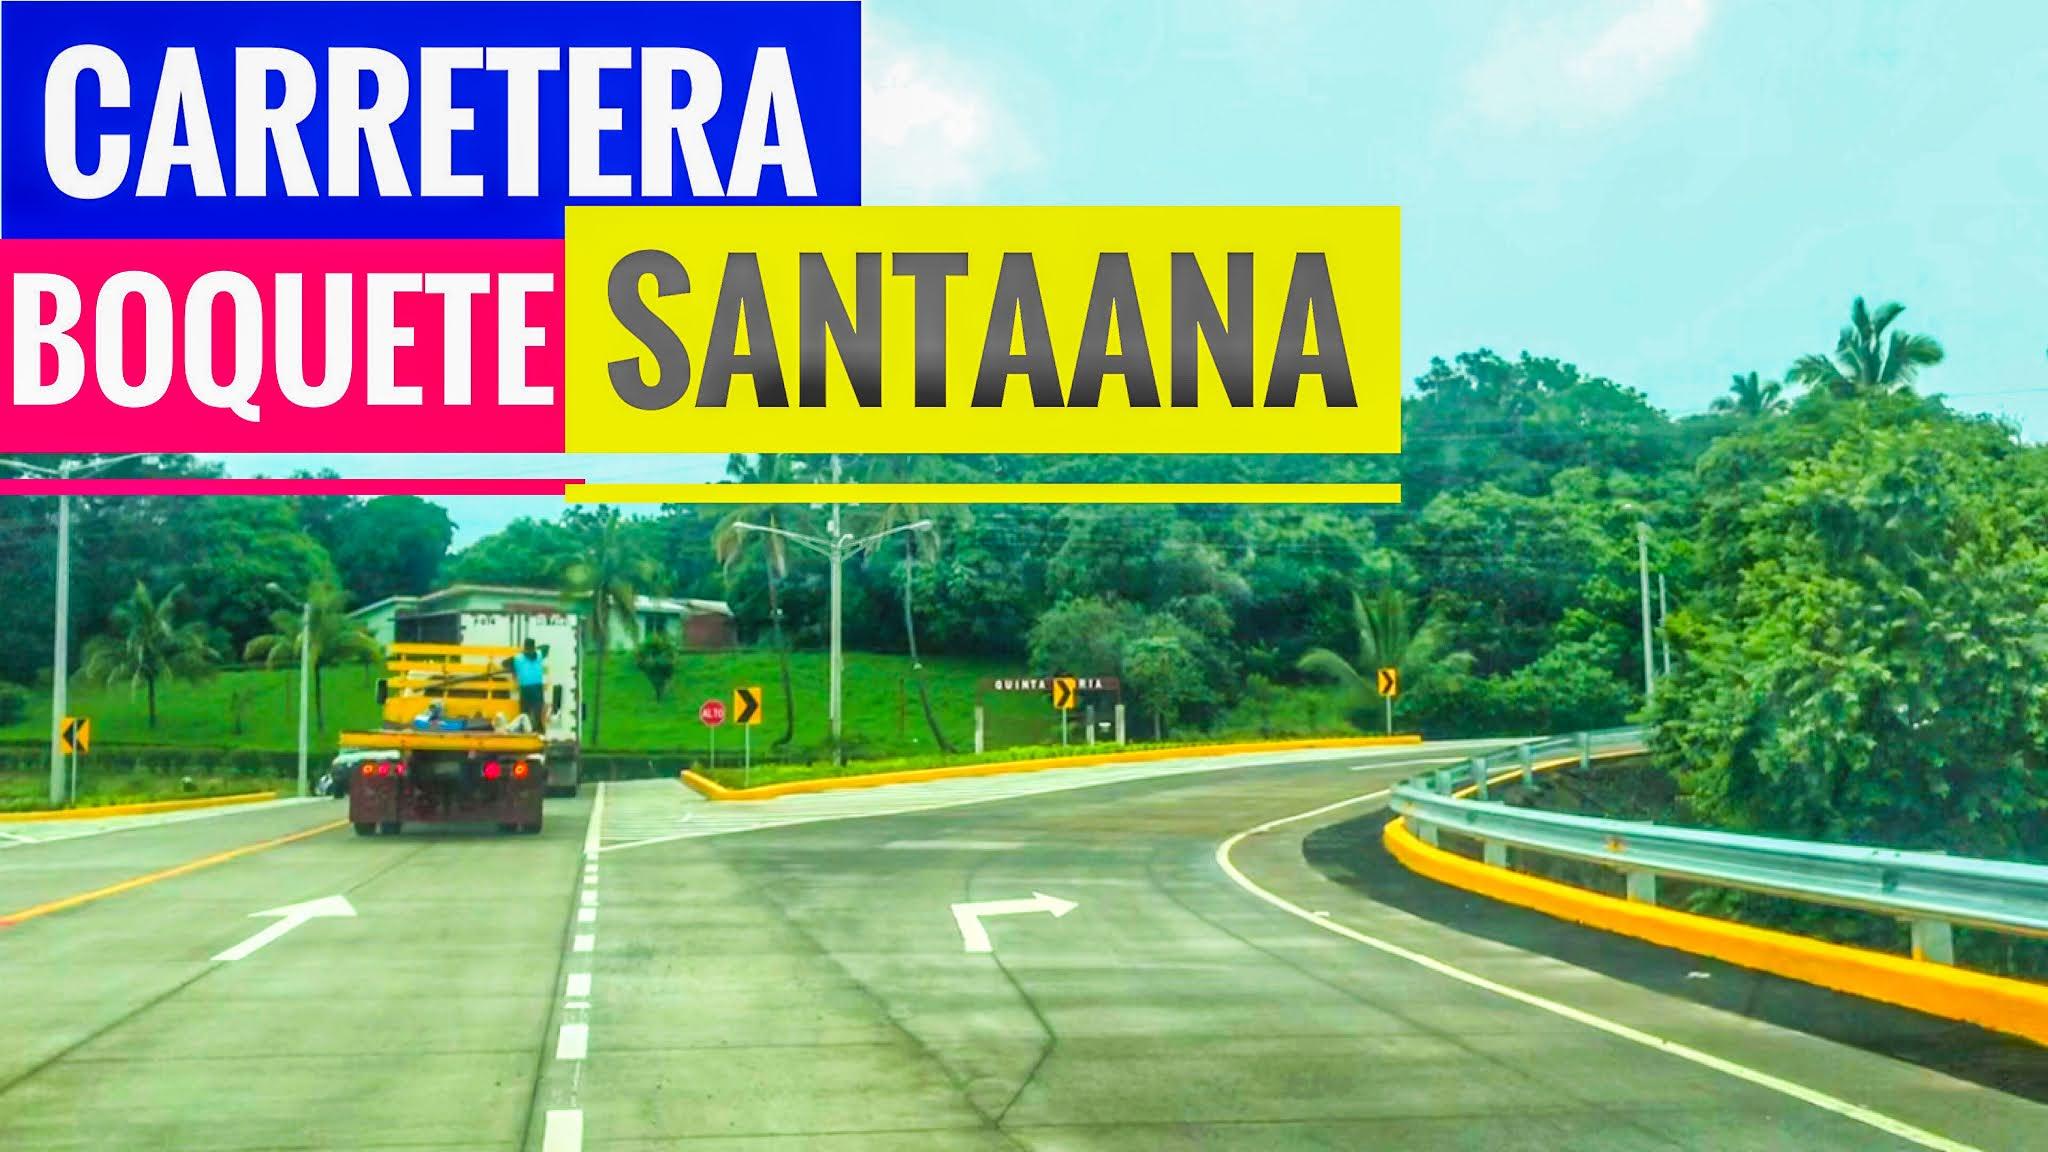 Carretera el boquete Santa Ana